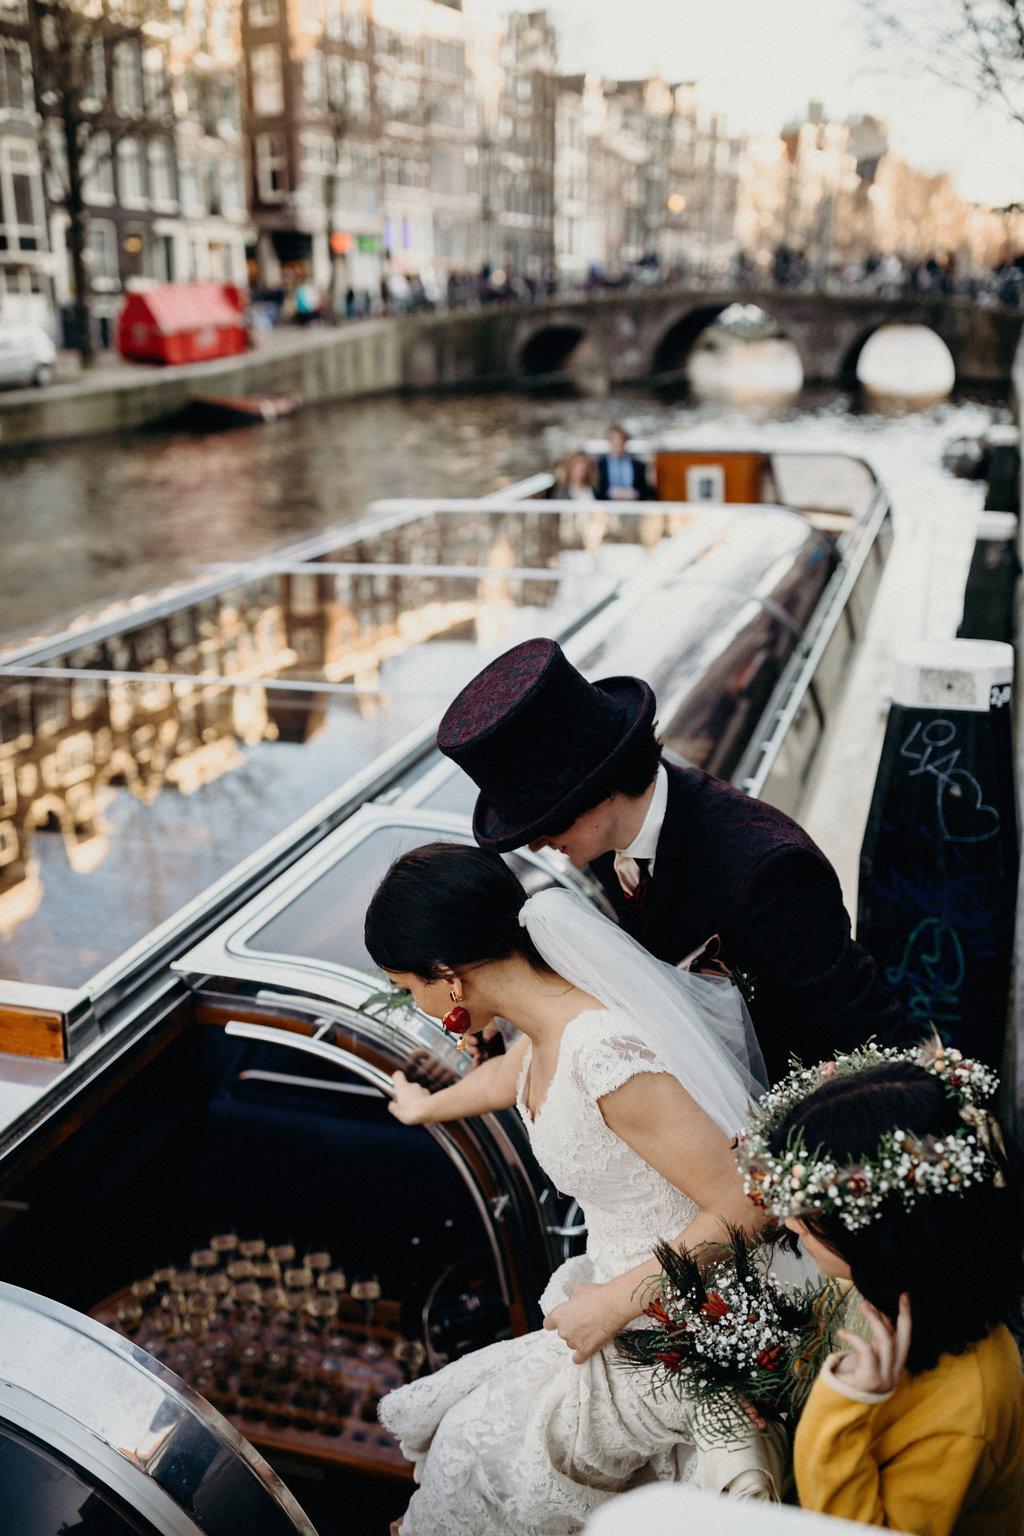 233-sjoerdbooijphotography-wedding-coen-janaina.jpg